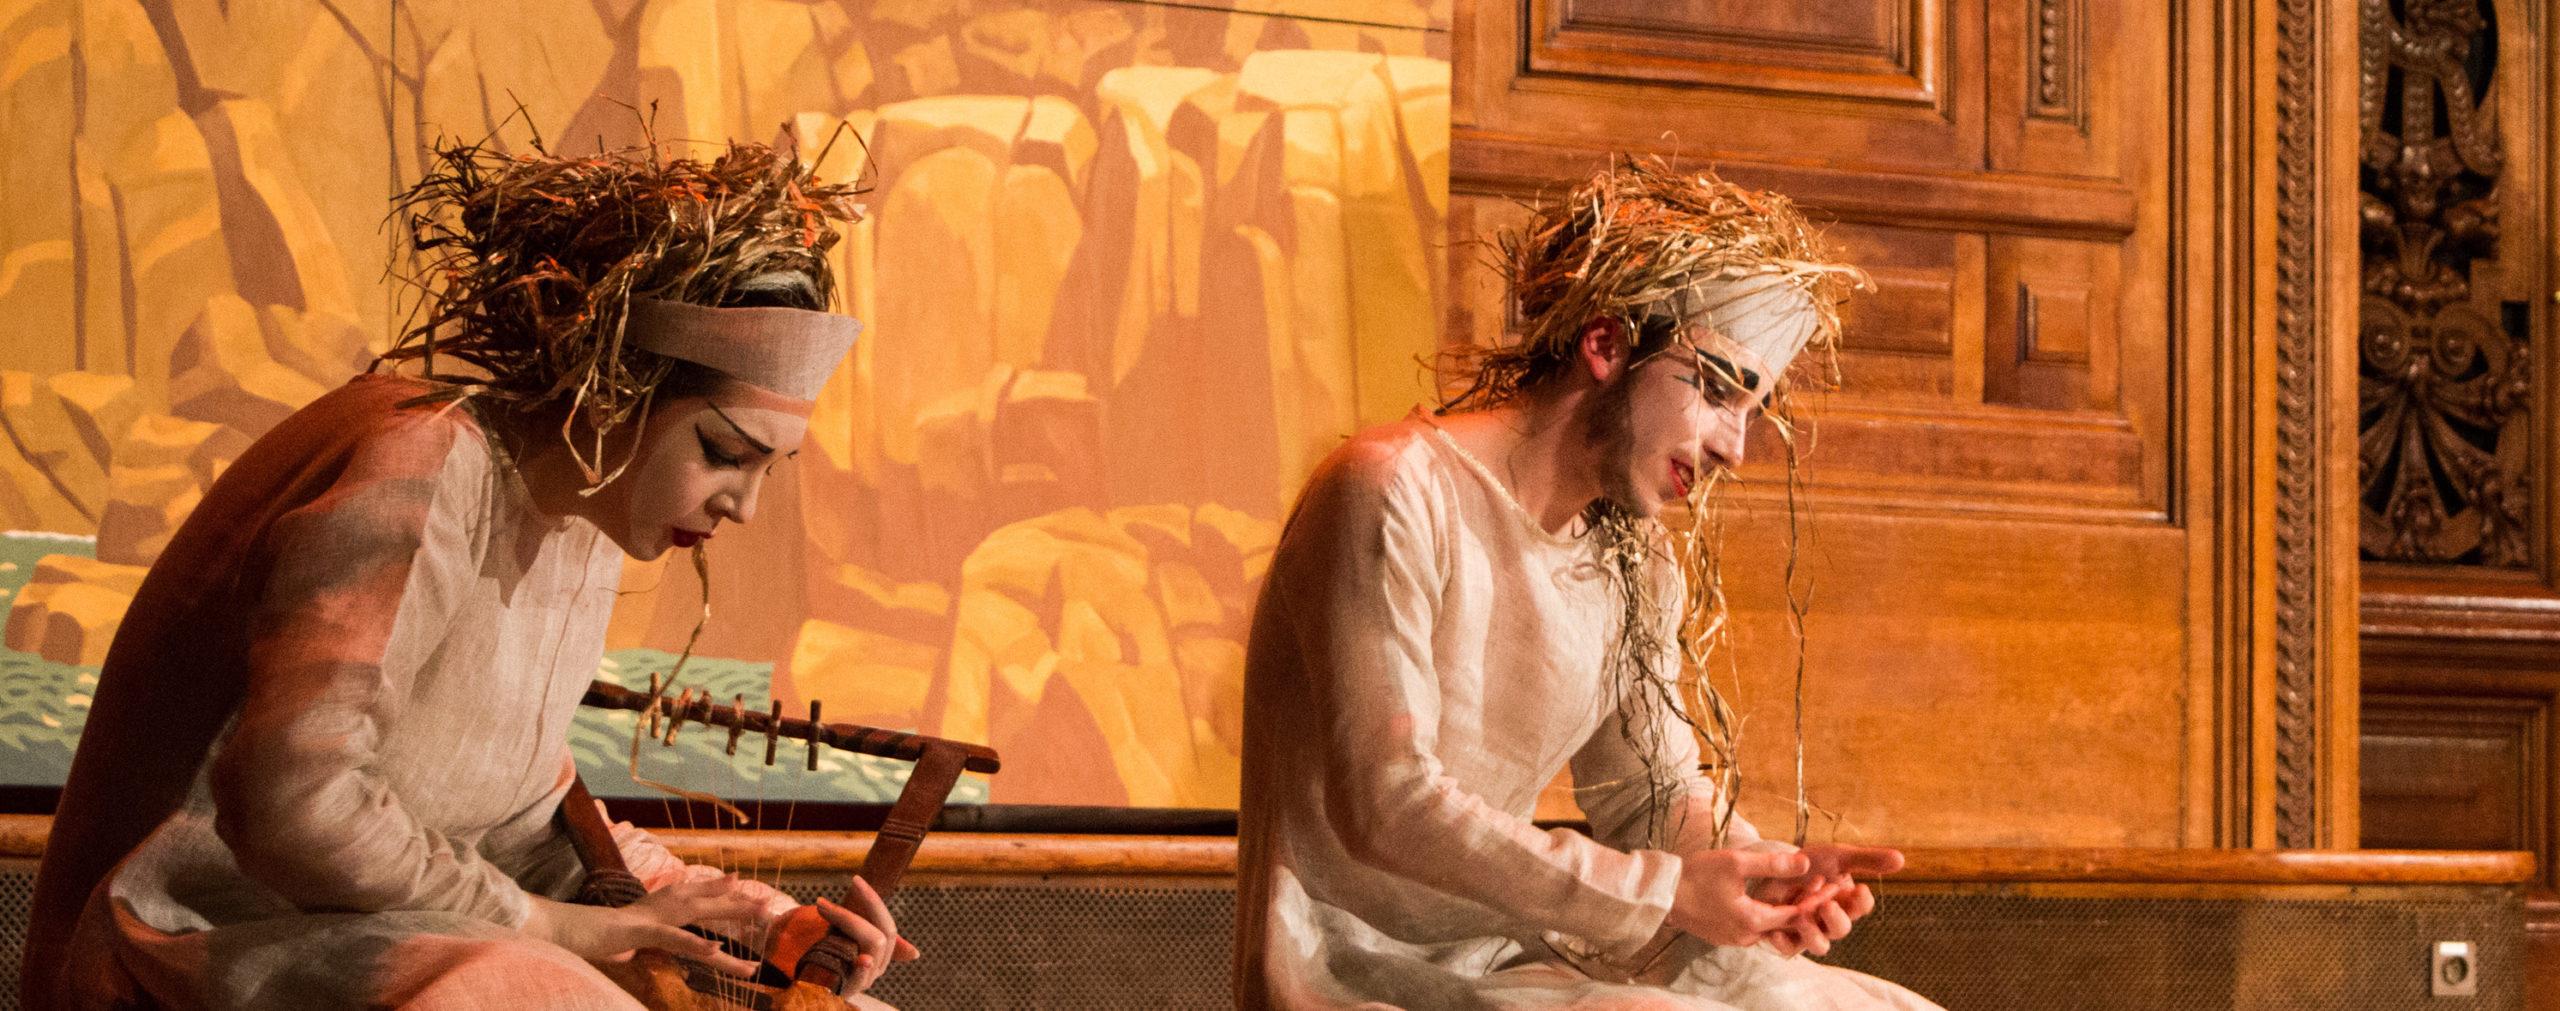 Intégrale de l'Odyssée : Ulysse, Pénélope, le bain de pieds